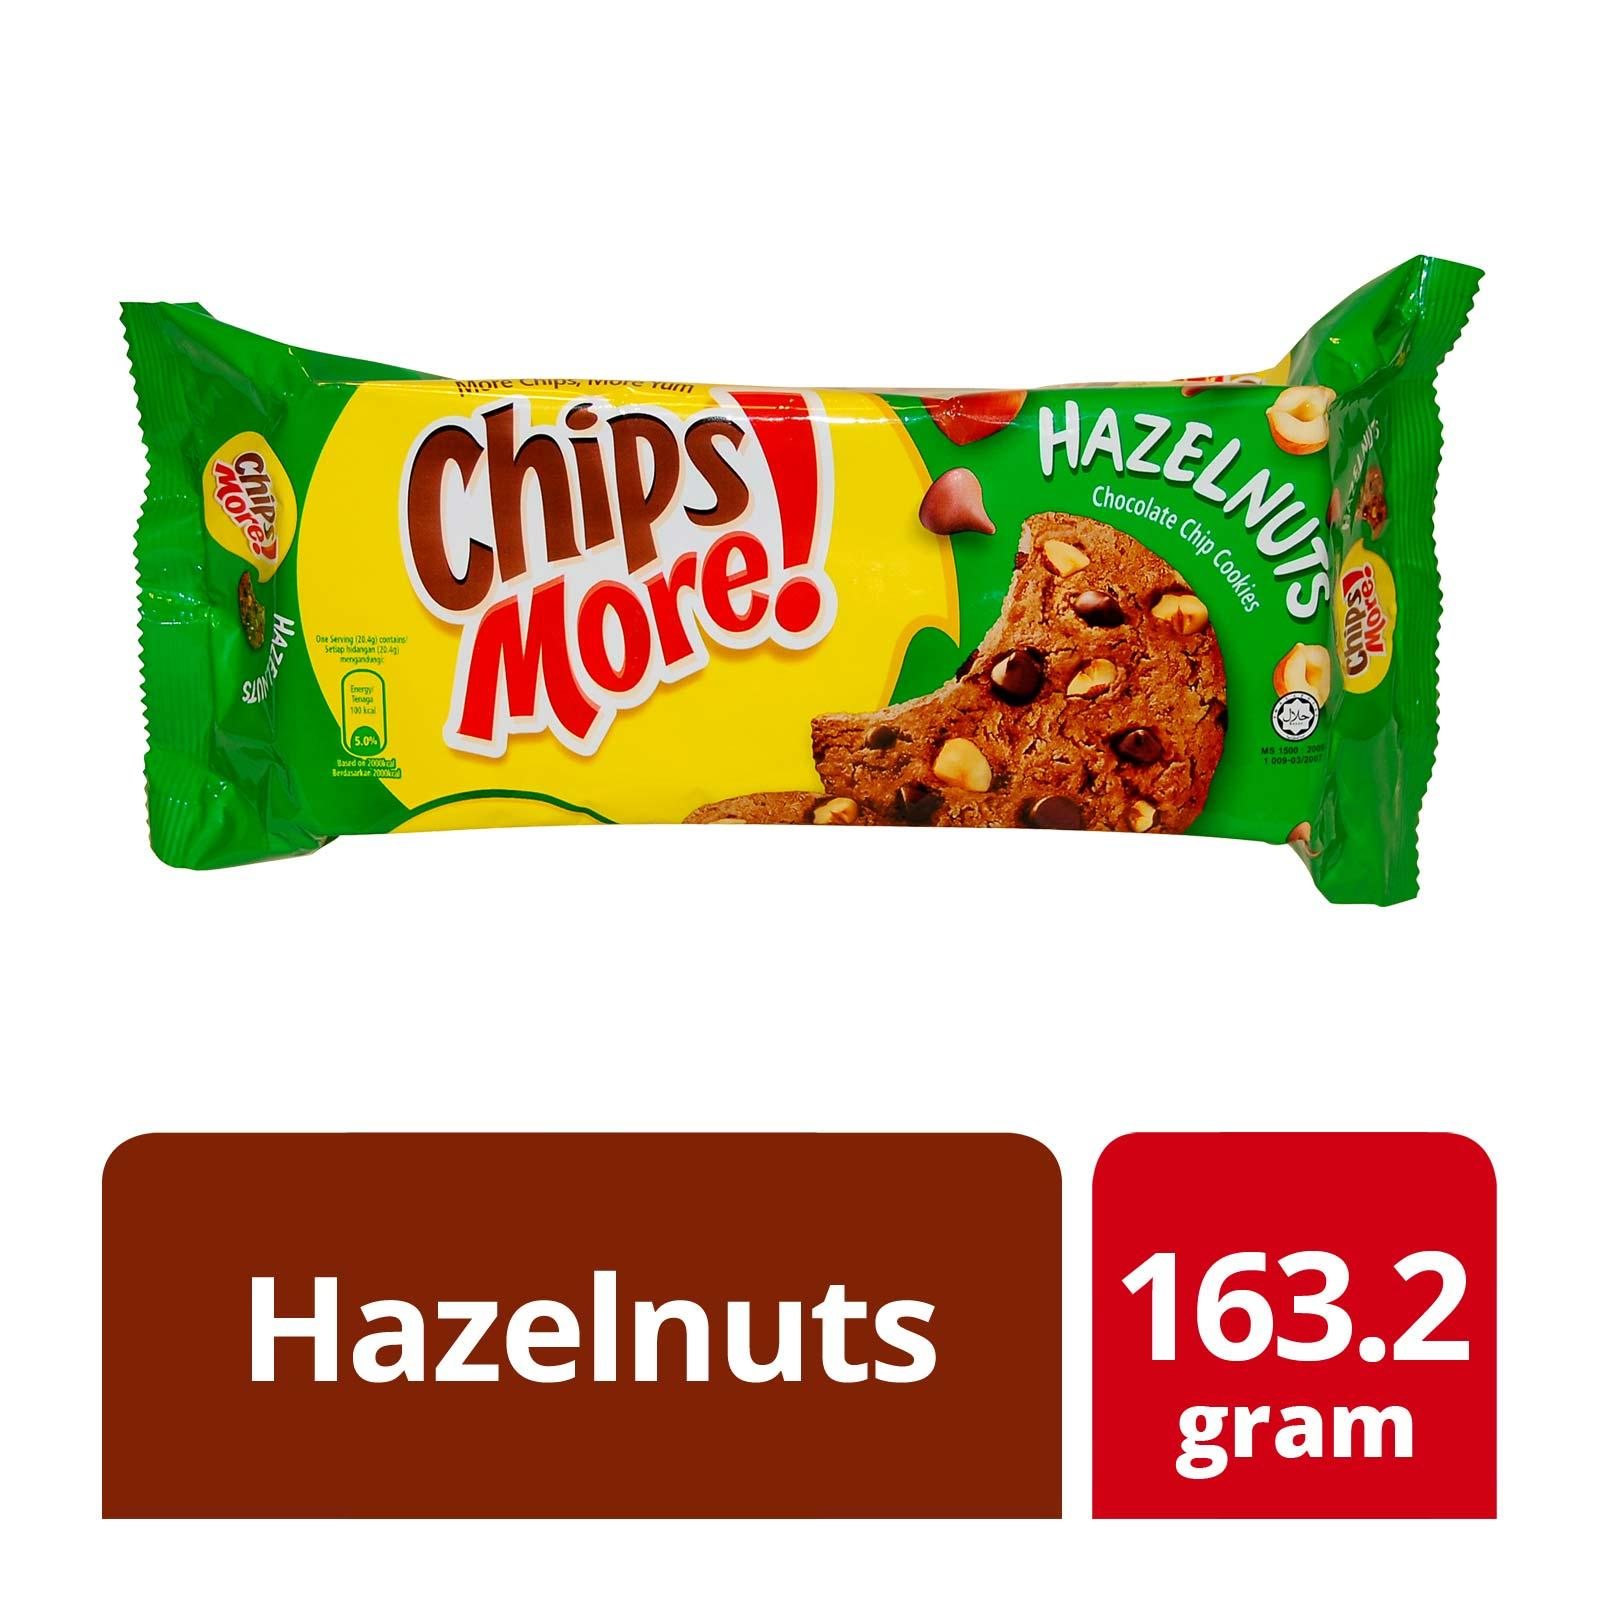 Chipsmore Hazelnuts Chocolate Chip Cookies